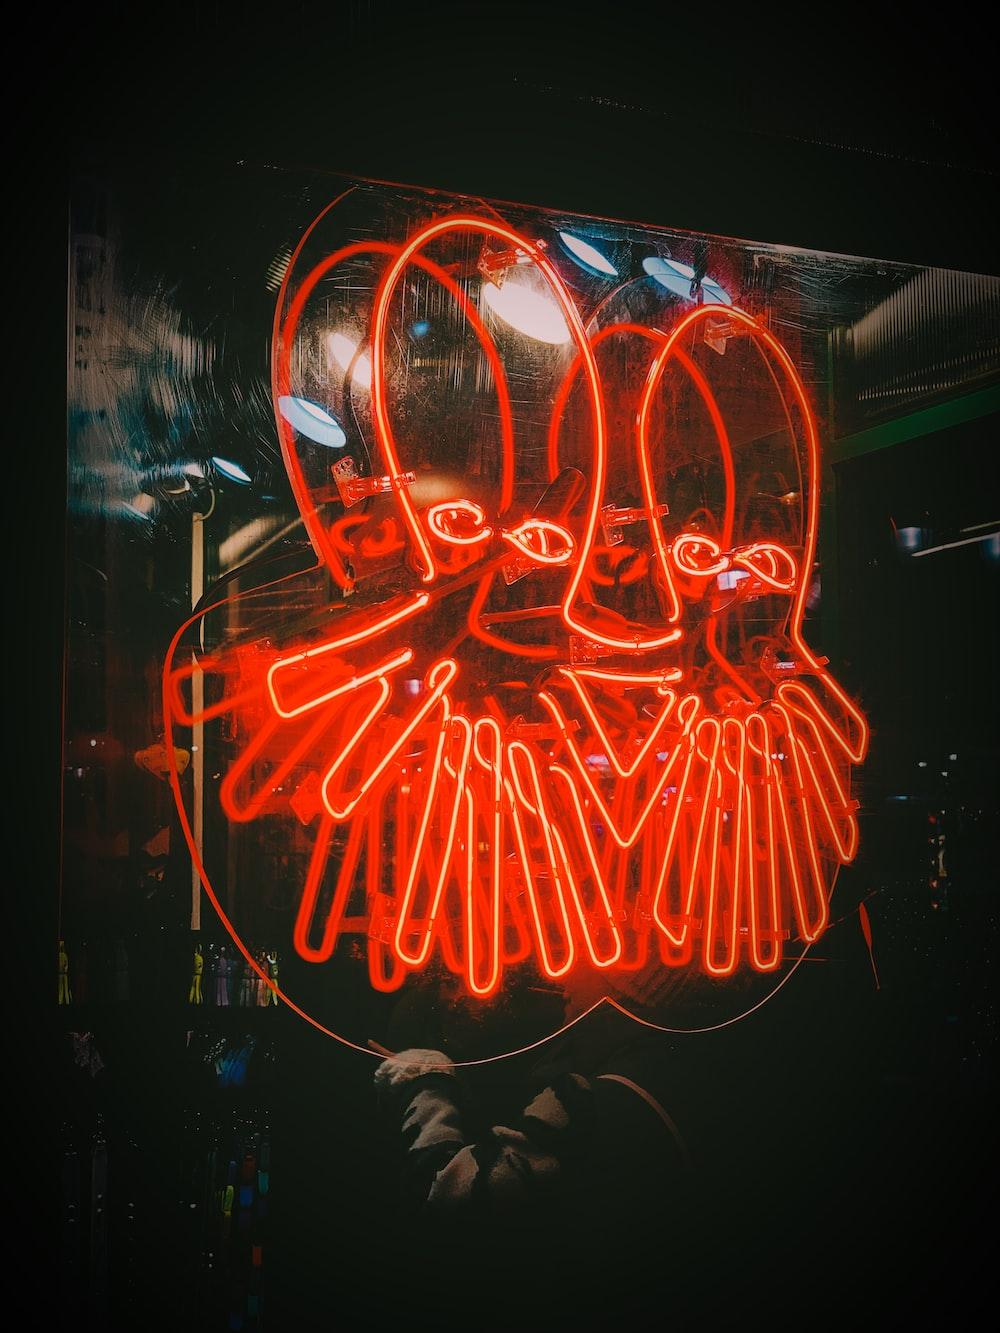 octopus neon signage turned on